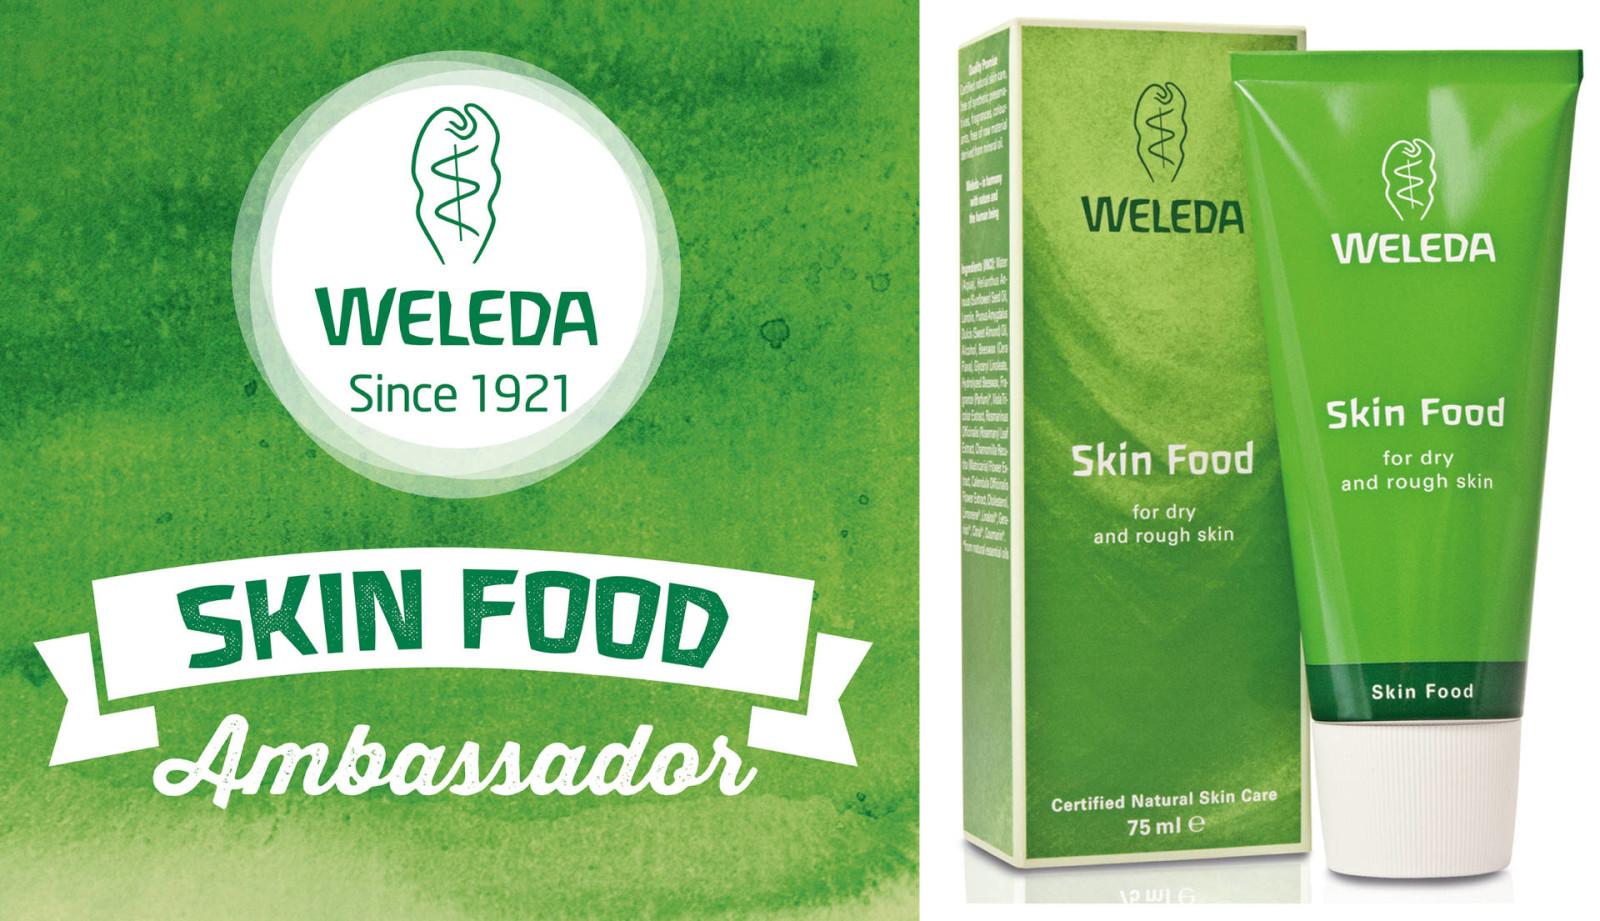 London Fashion Week, Weleda and Skin Food..